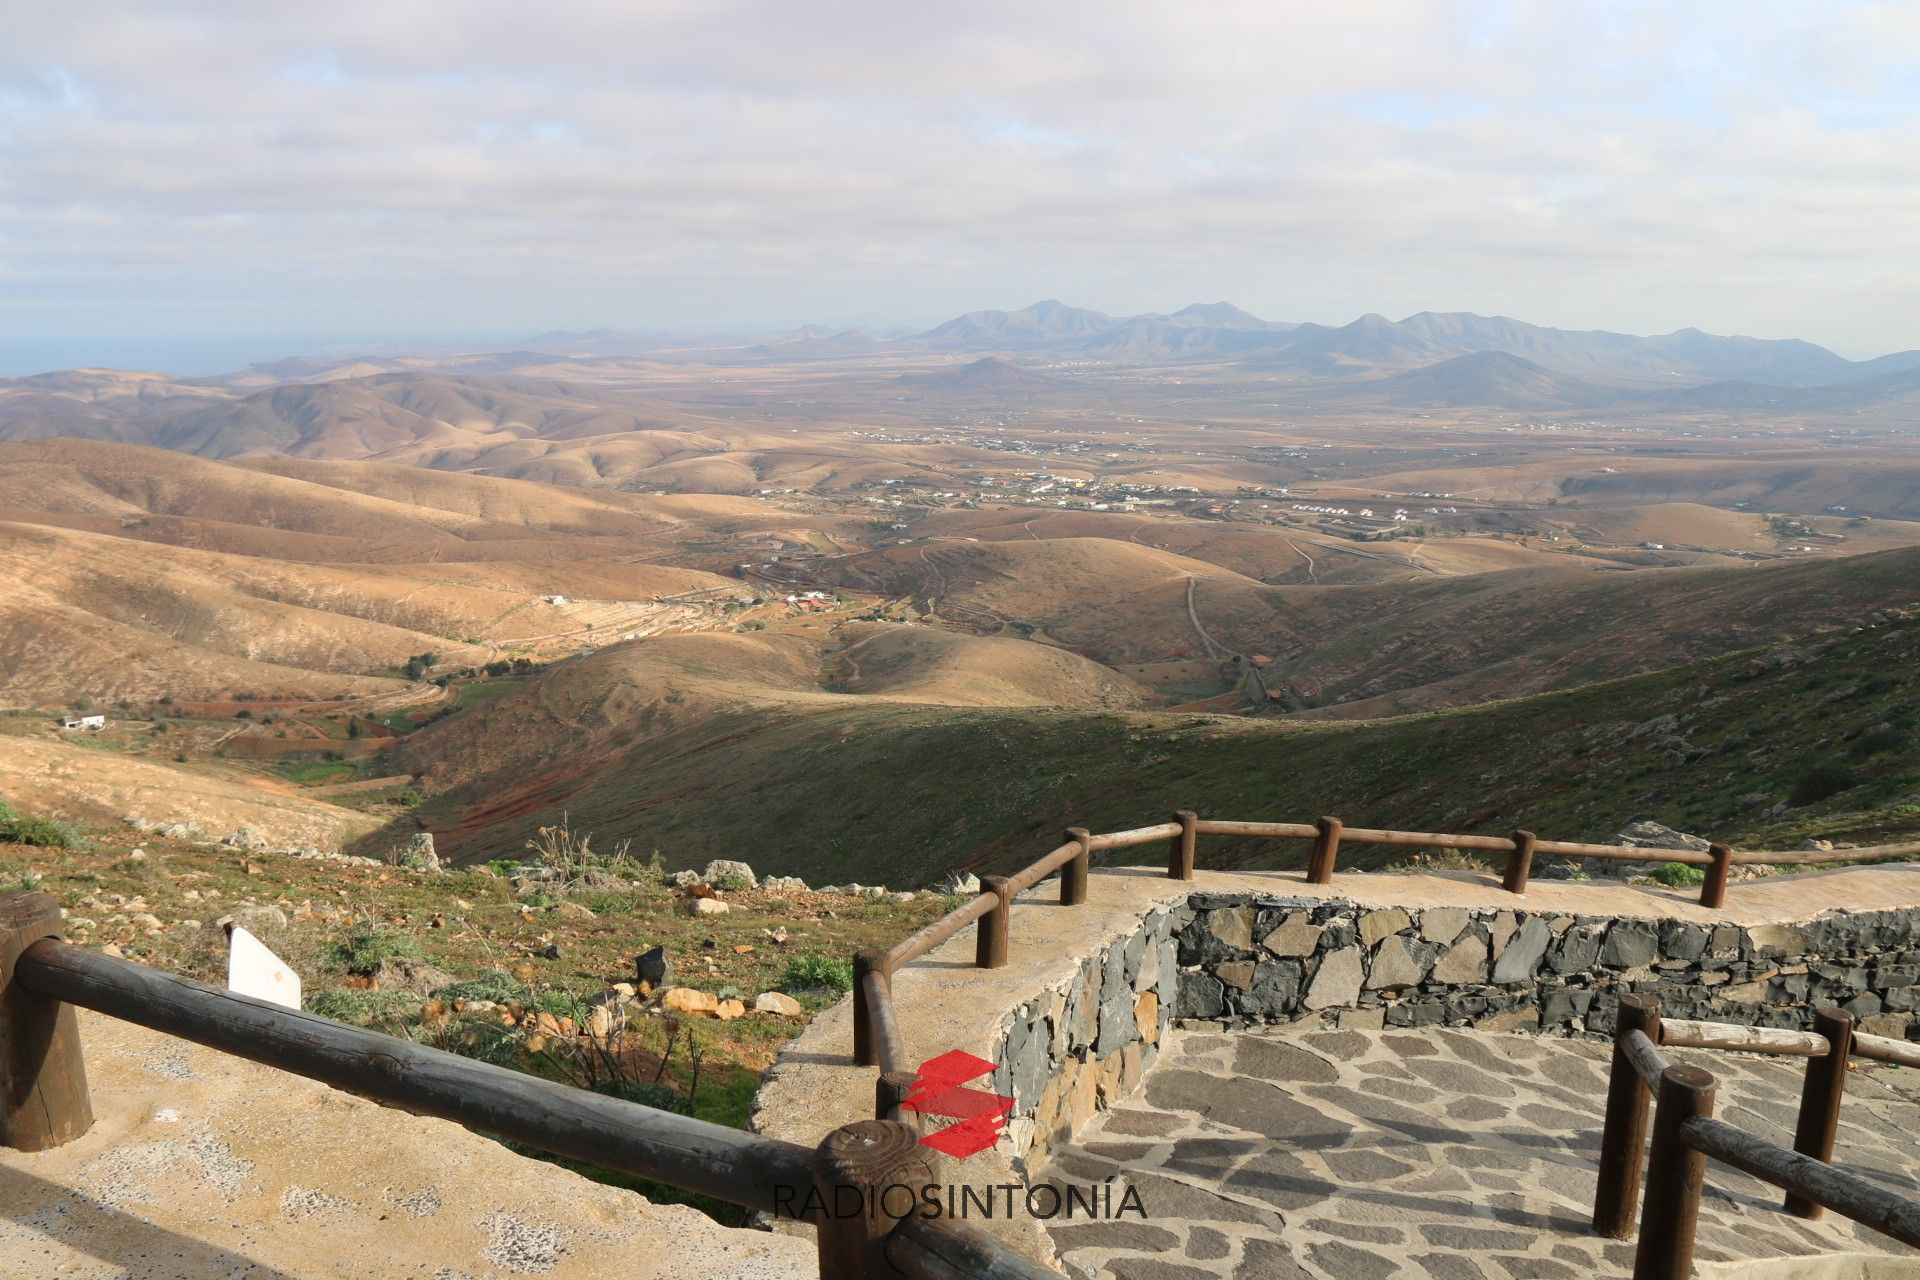 Vistas desde un Mirador de Betancuria, cercano a Morro Velosa